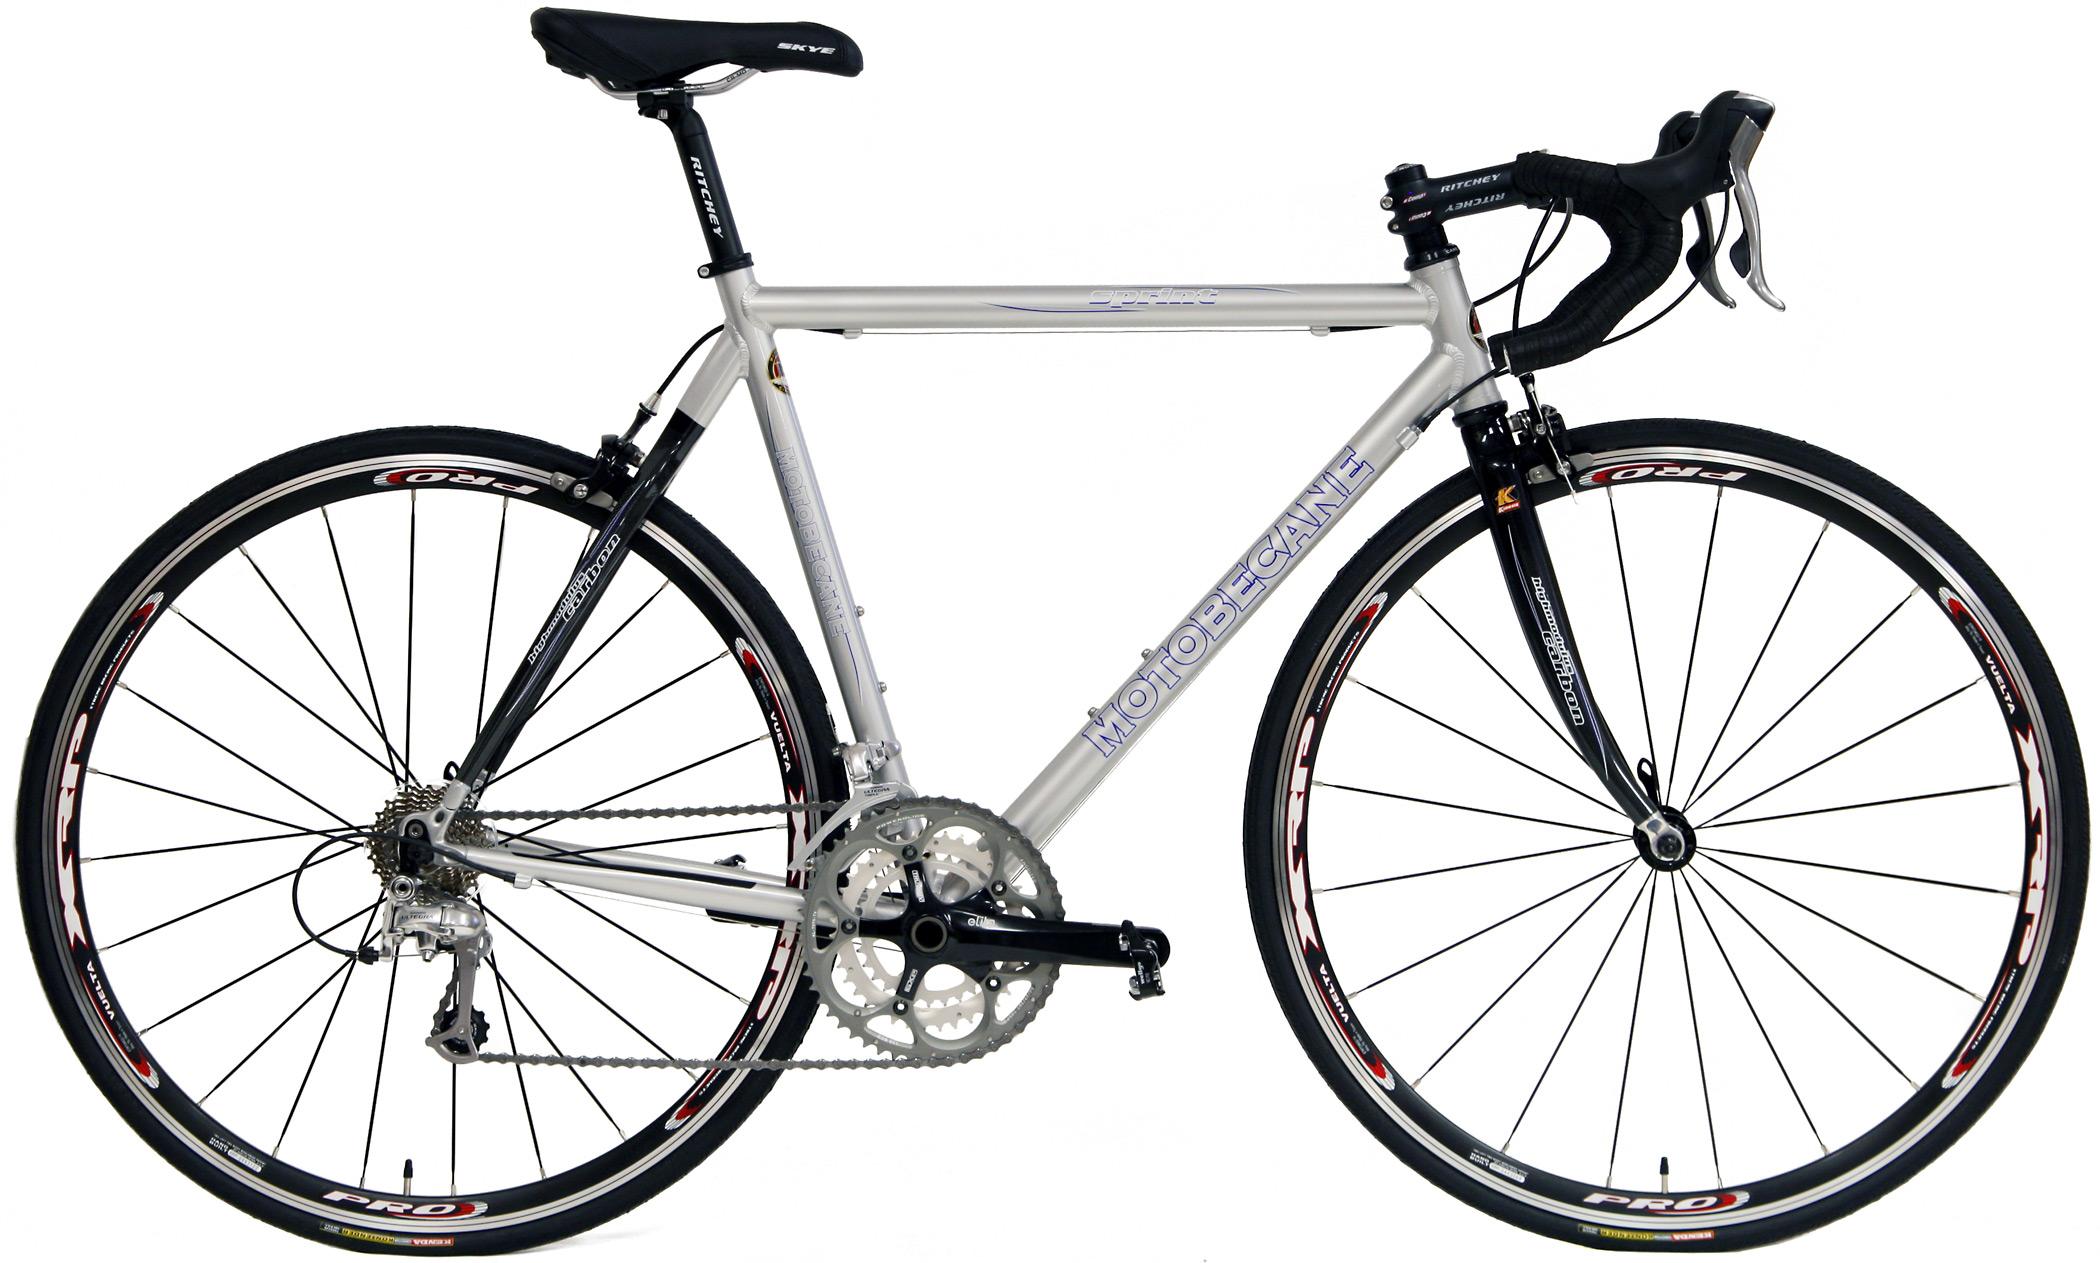 Shimano Ultegra Road Bikes